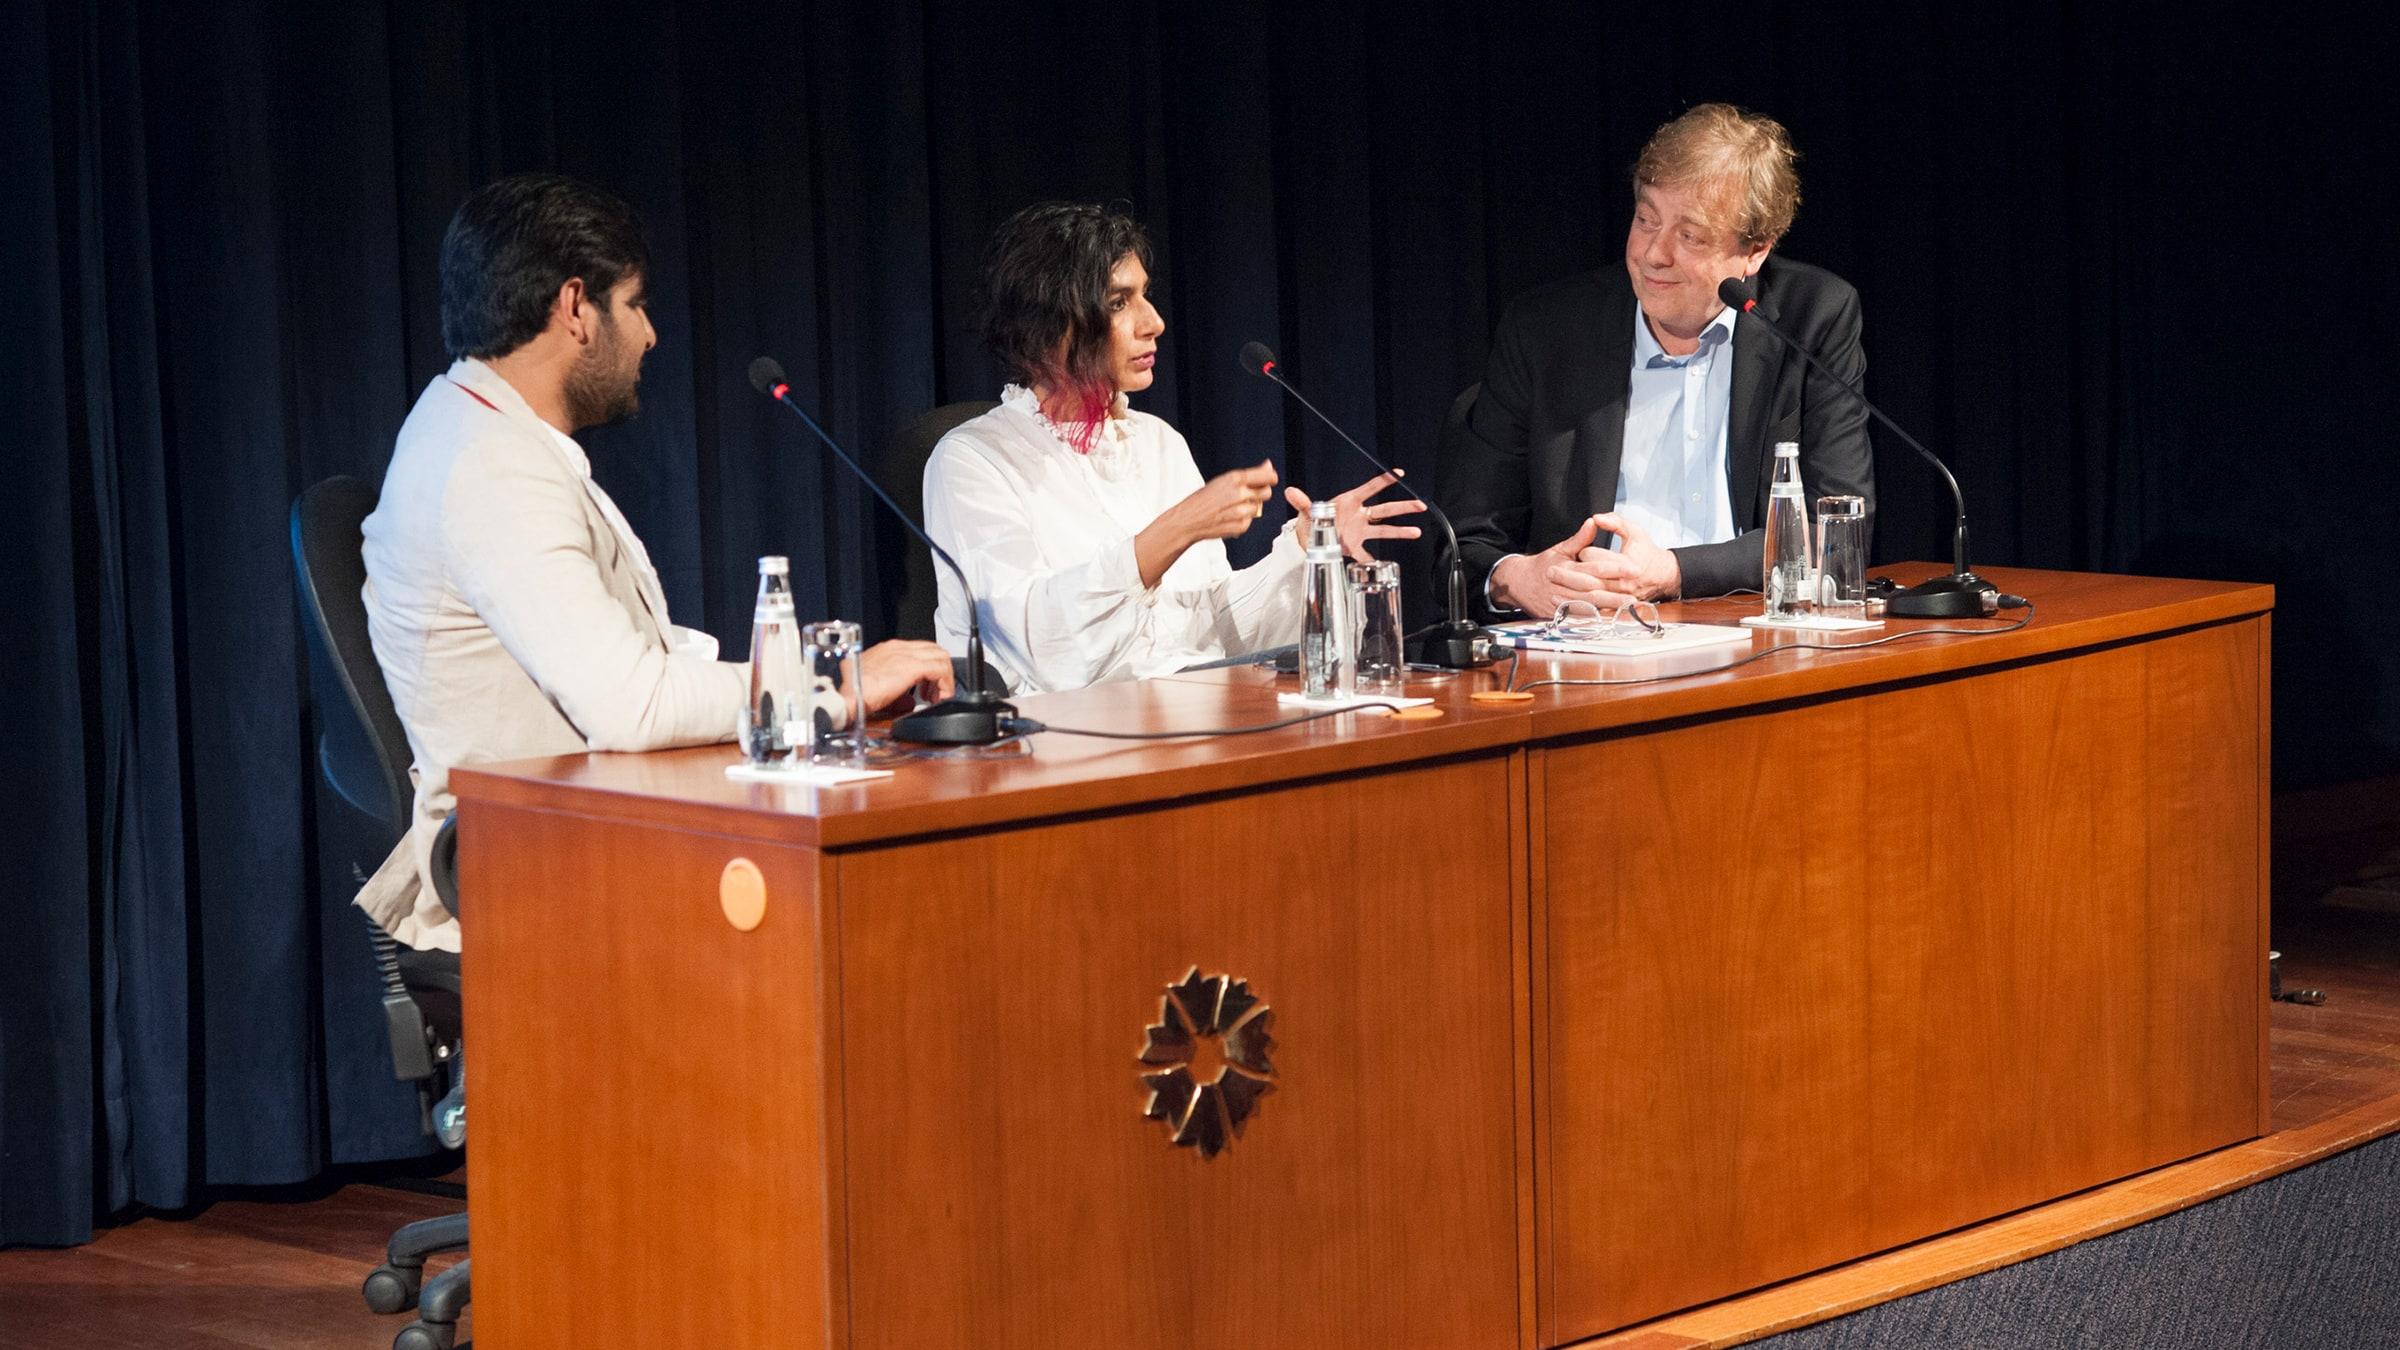 Alistair Hicks, Waqas Khan, RAQS Media Collective